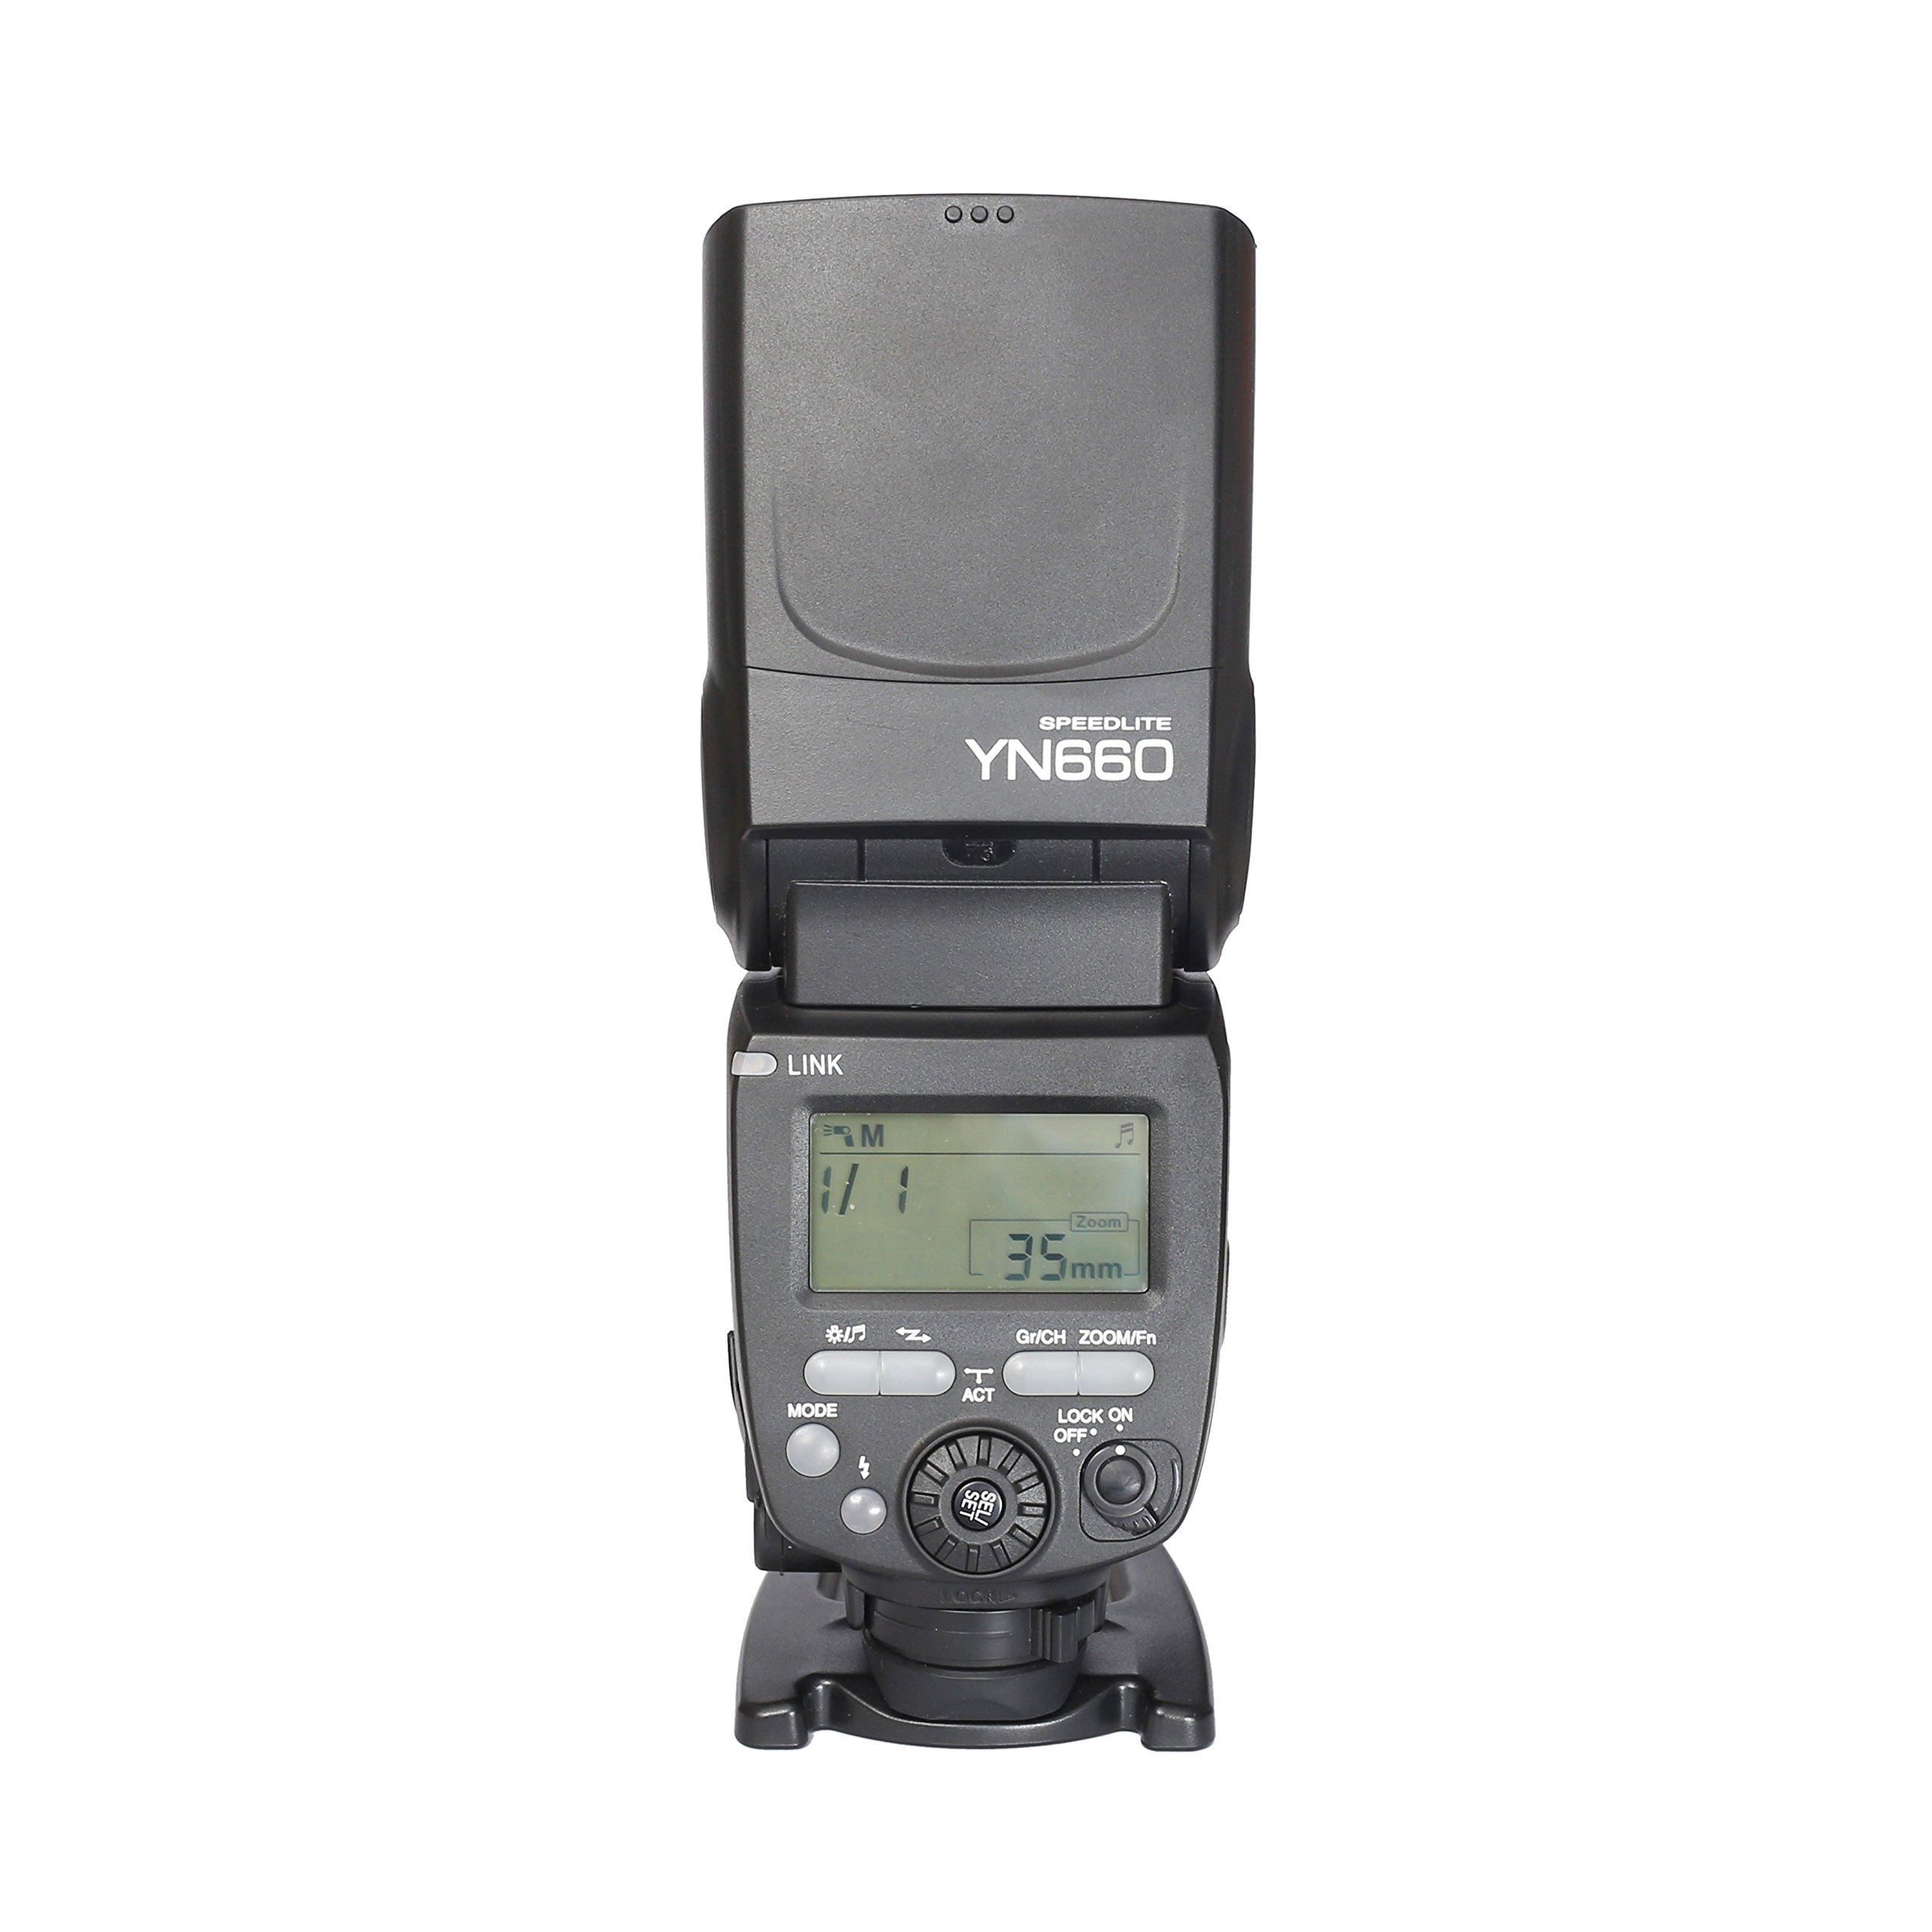 YONGNUO YN660 Wireless Manual Flash Speedlite GN66 2.4G Wireless Radio Master+ Slave for Canon Nikon Pentax Olympus by YONGNUO